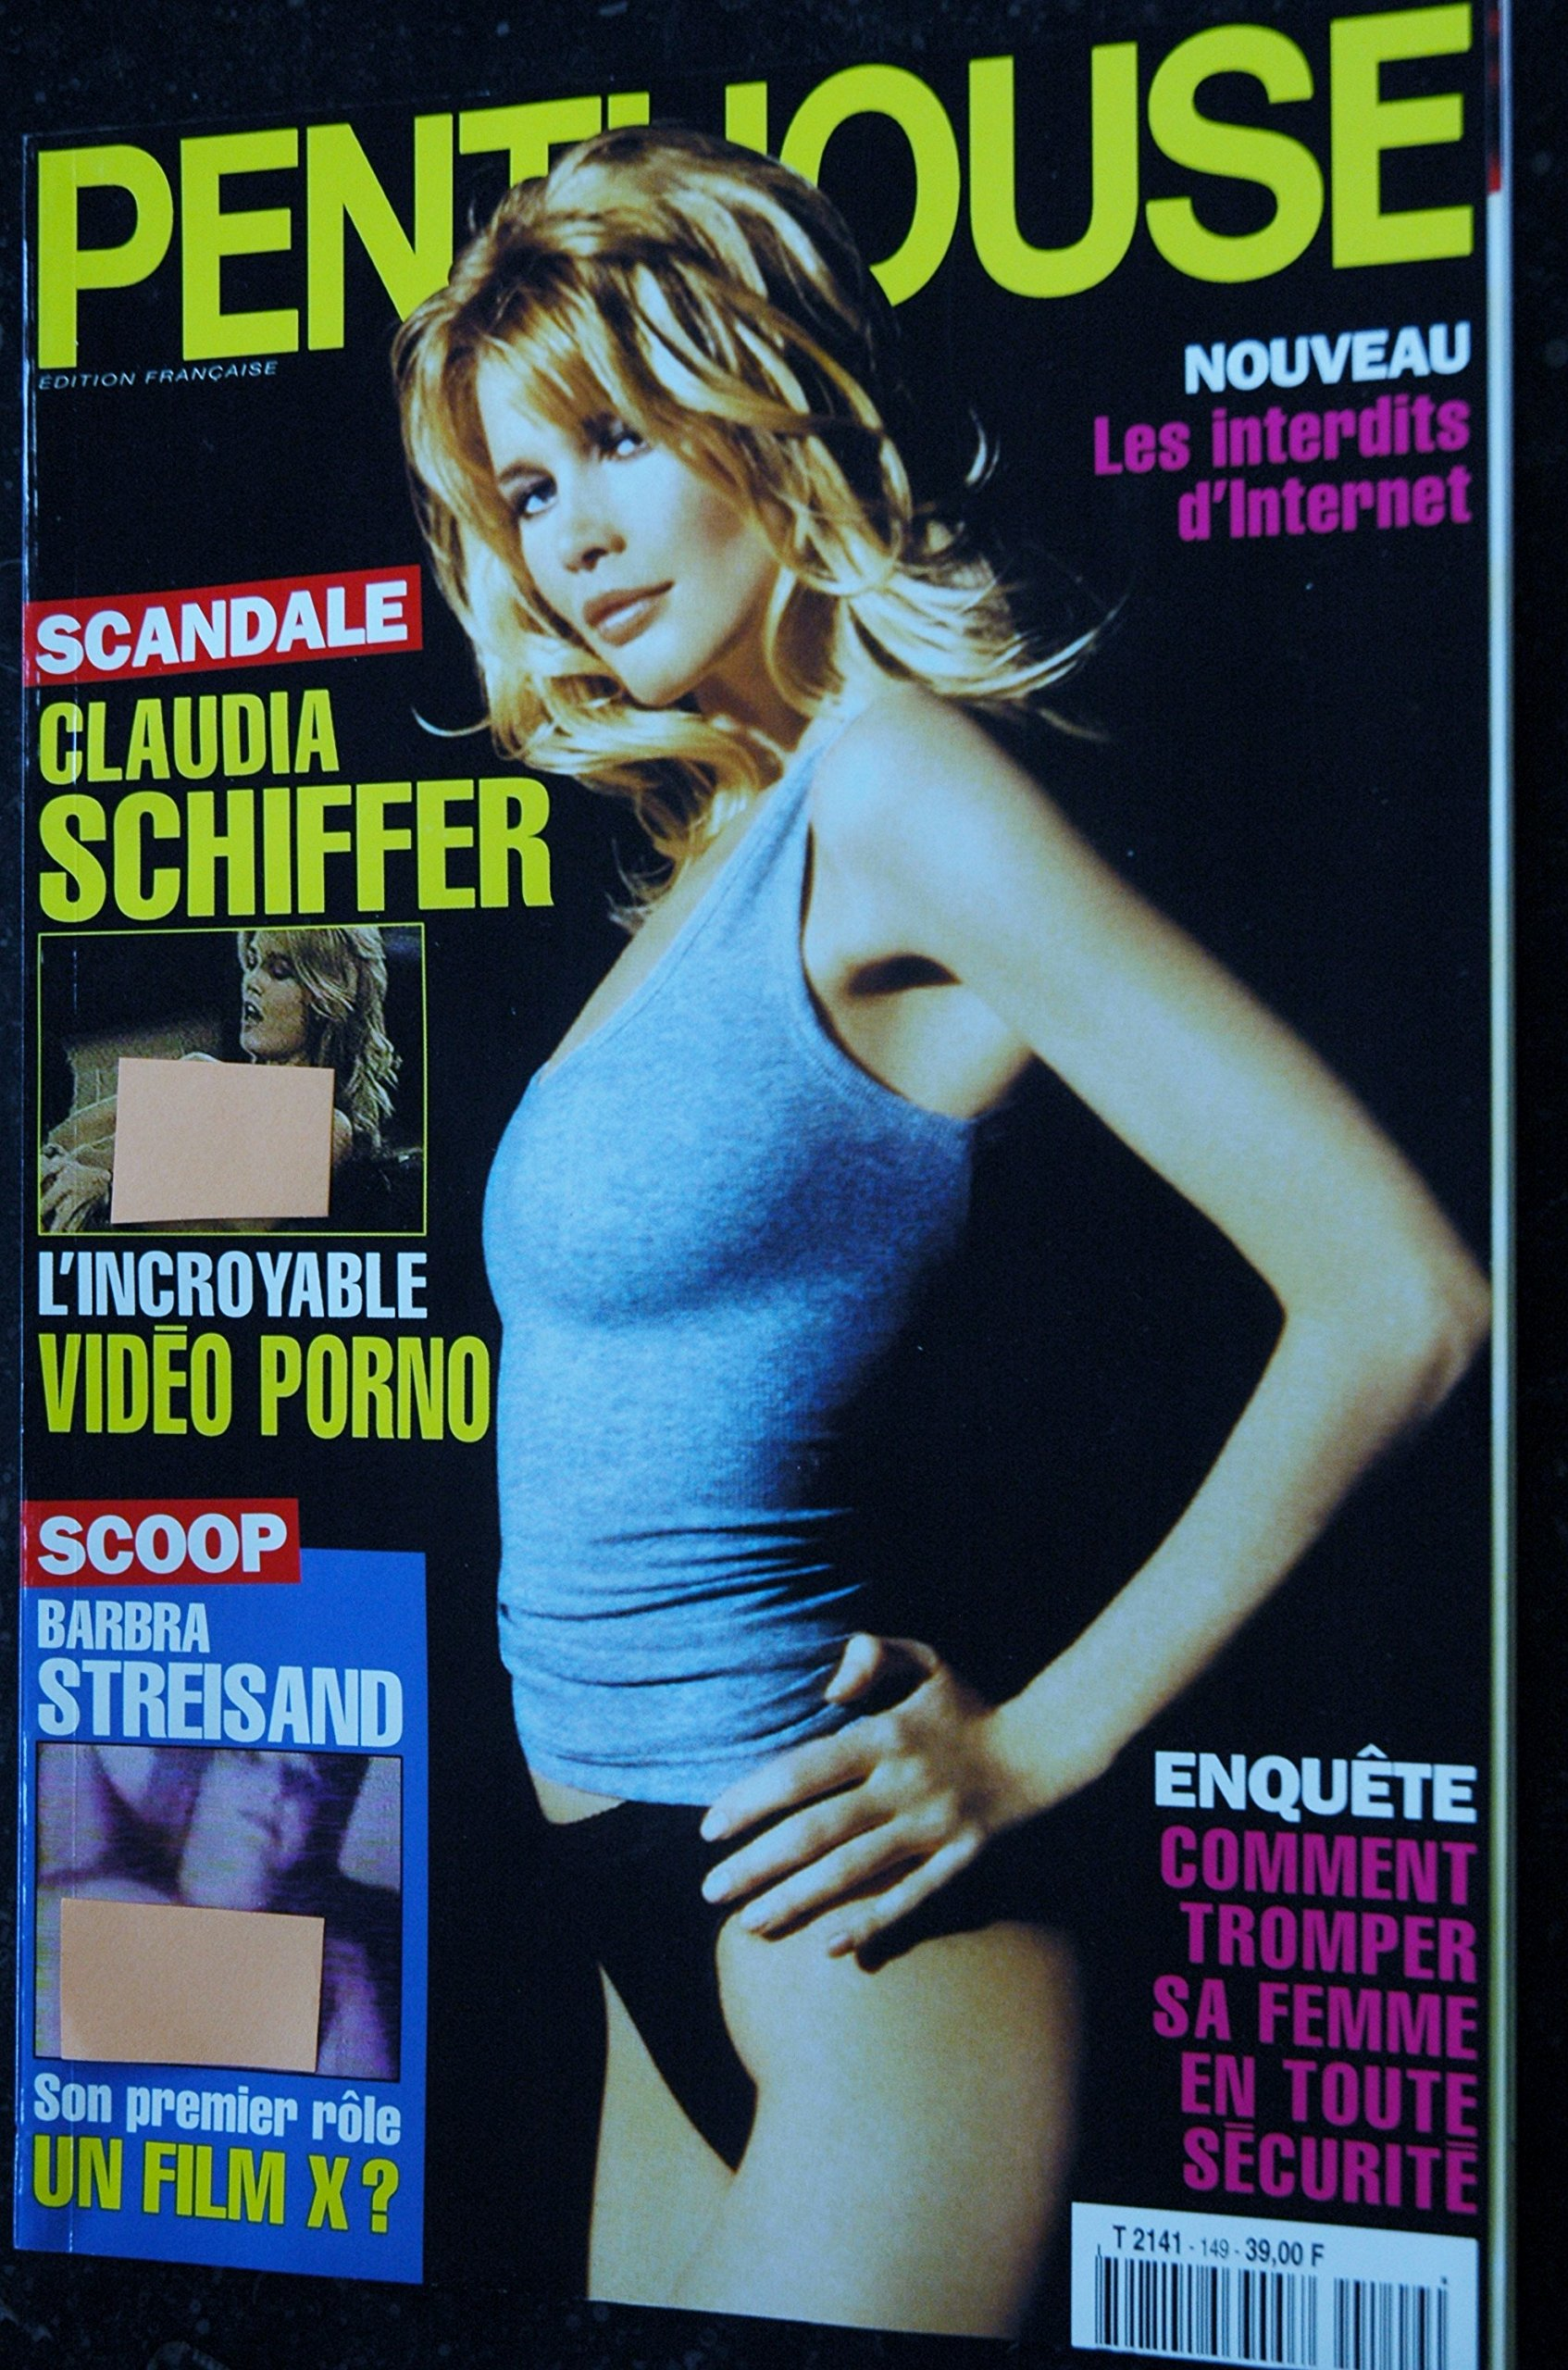 Claudia schiffer pornó videó